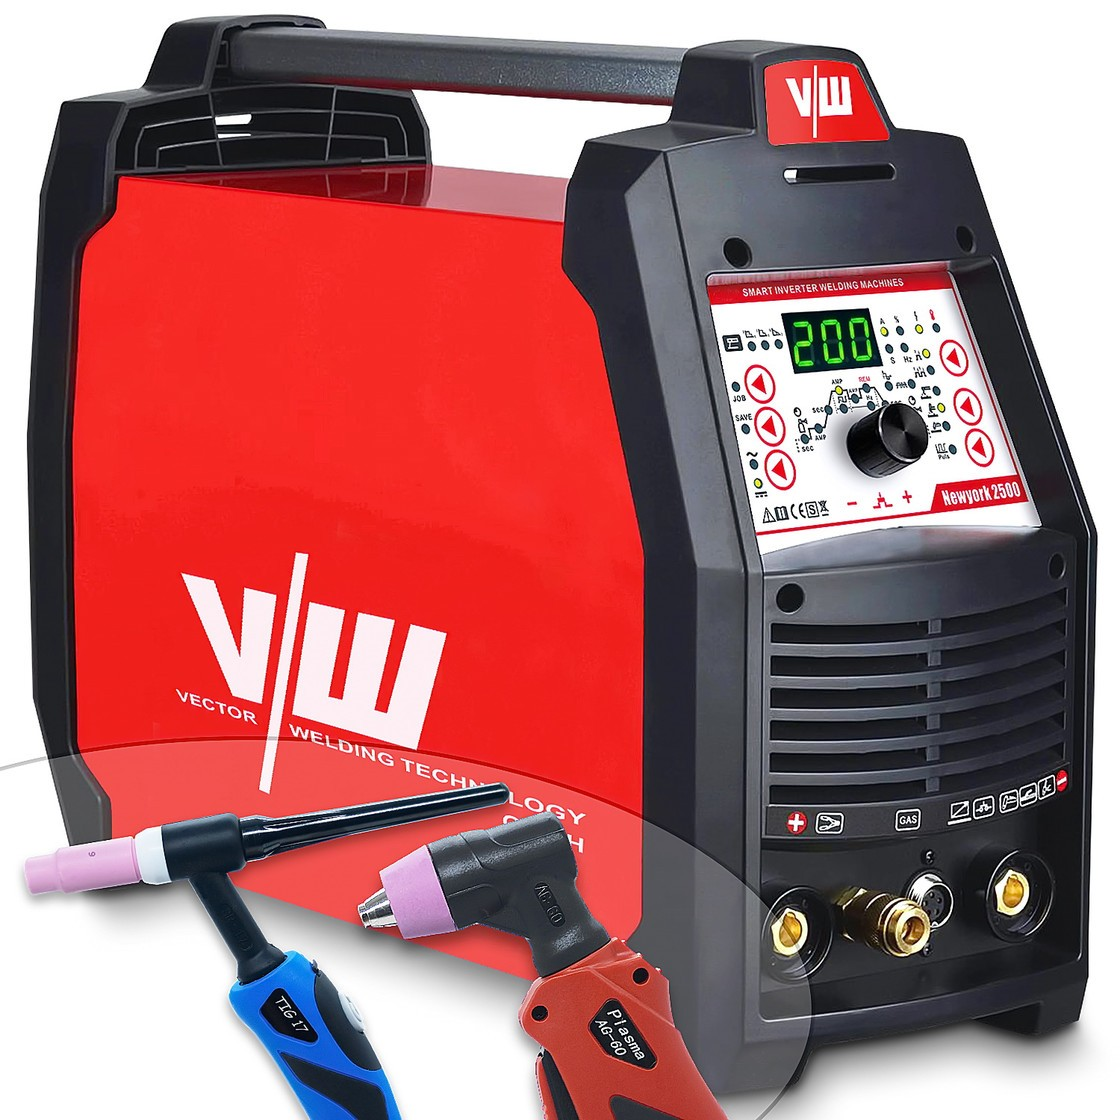 Máquina de soldadura 200A con cortador de plasma 50A, inversor de pulsos, MMA/Stick, IGBT, encendido HF, aluminio-New York 2500